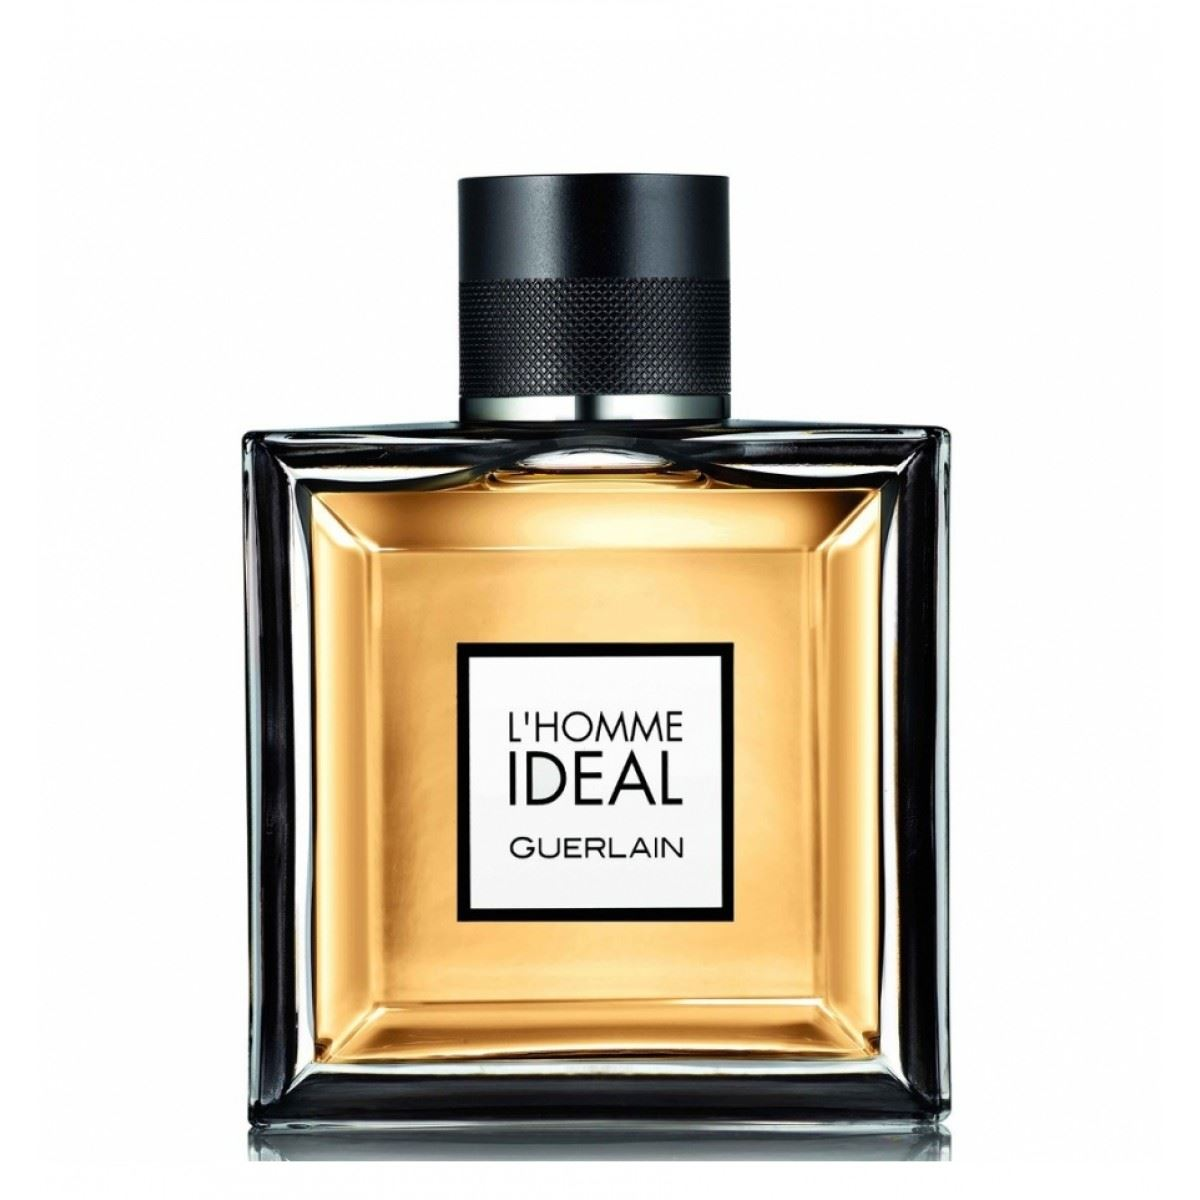 Guerlain L'Homme Ideal EDT 100 ml - Erkek Parfümü